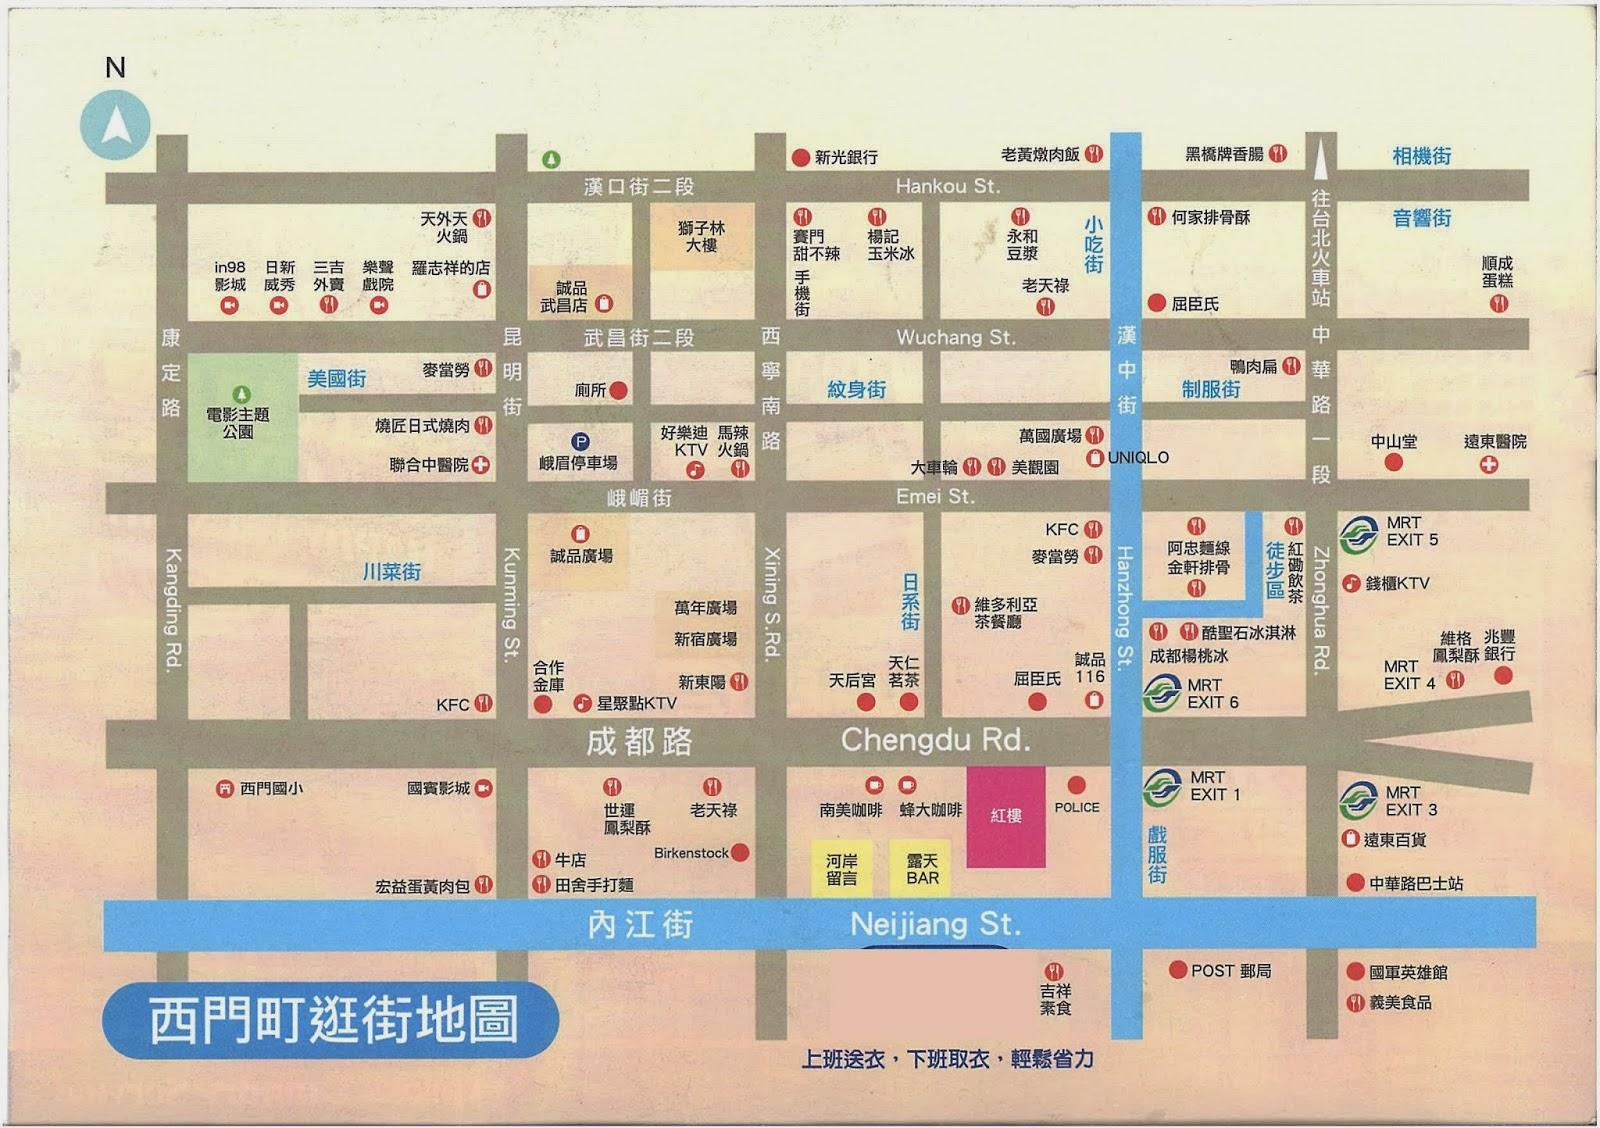 Holmes尋夢園: 西門町逛街地圖